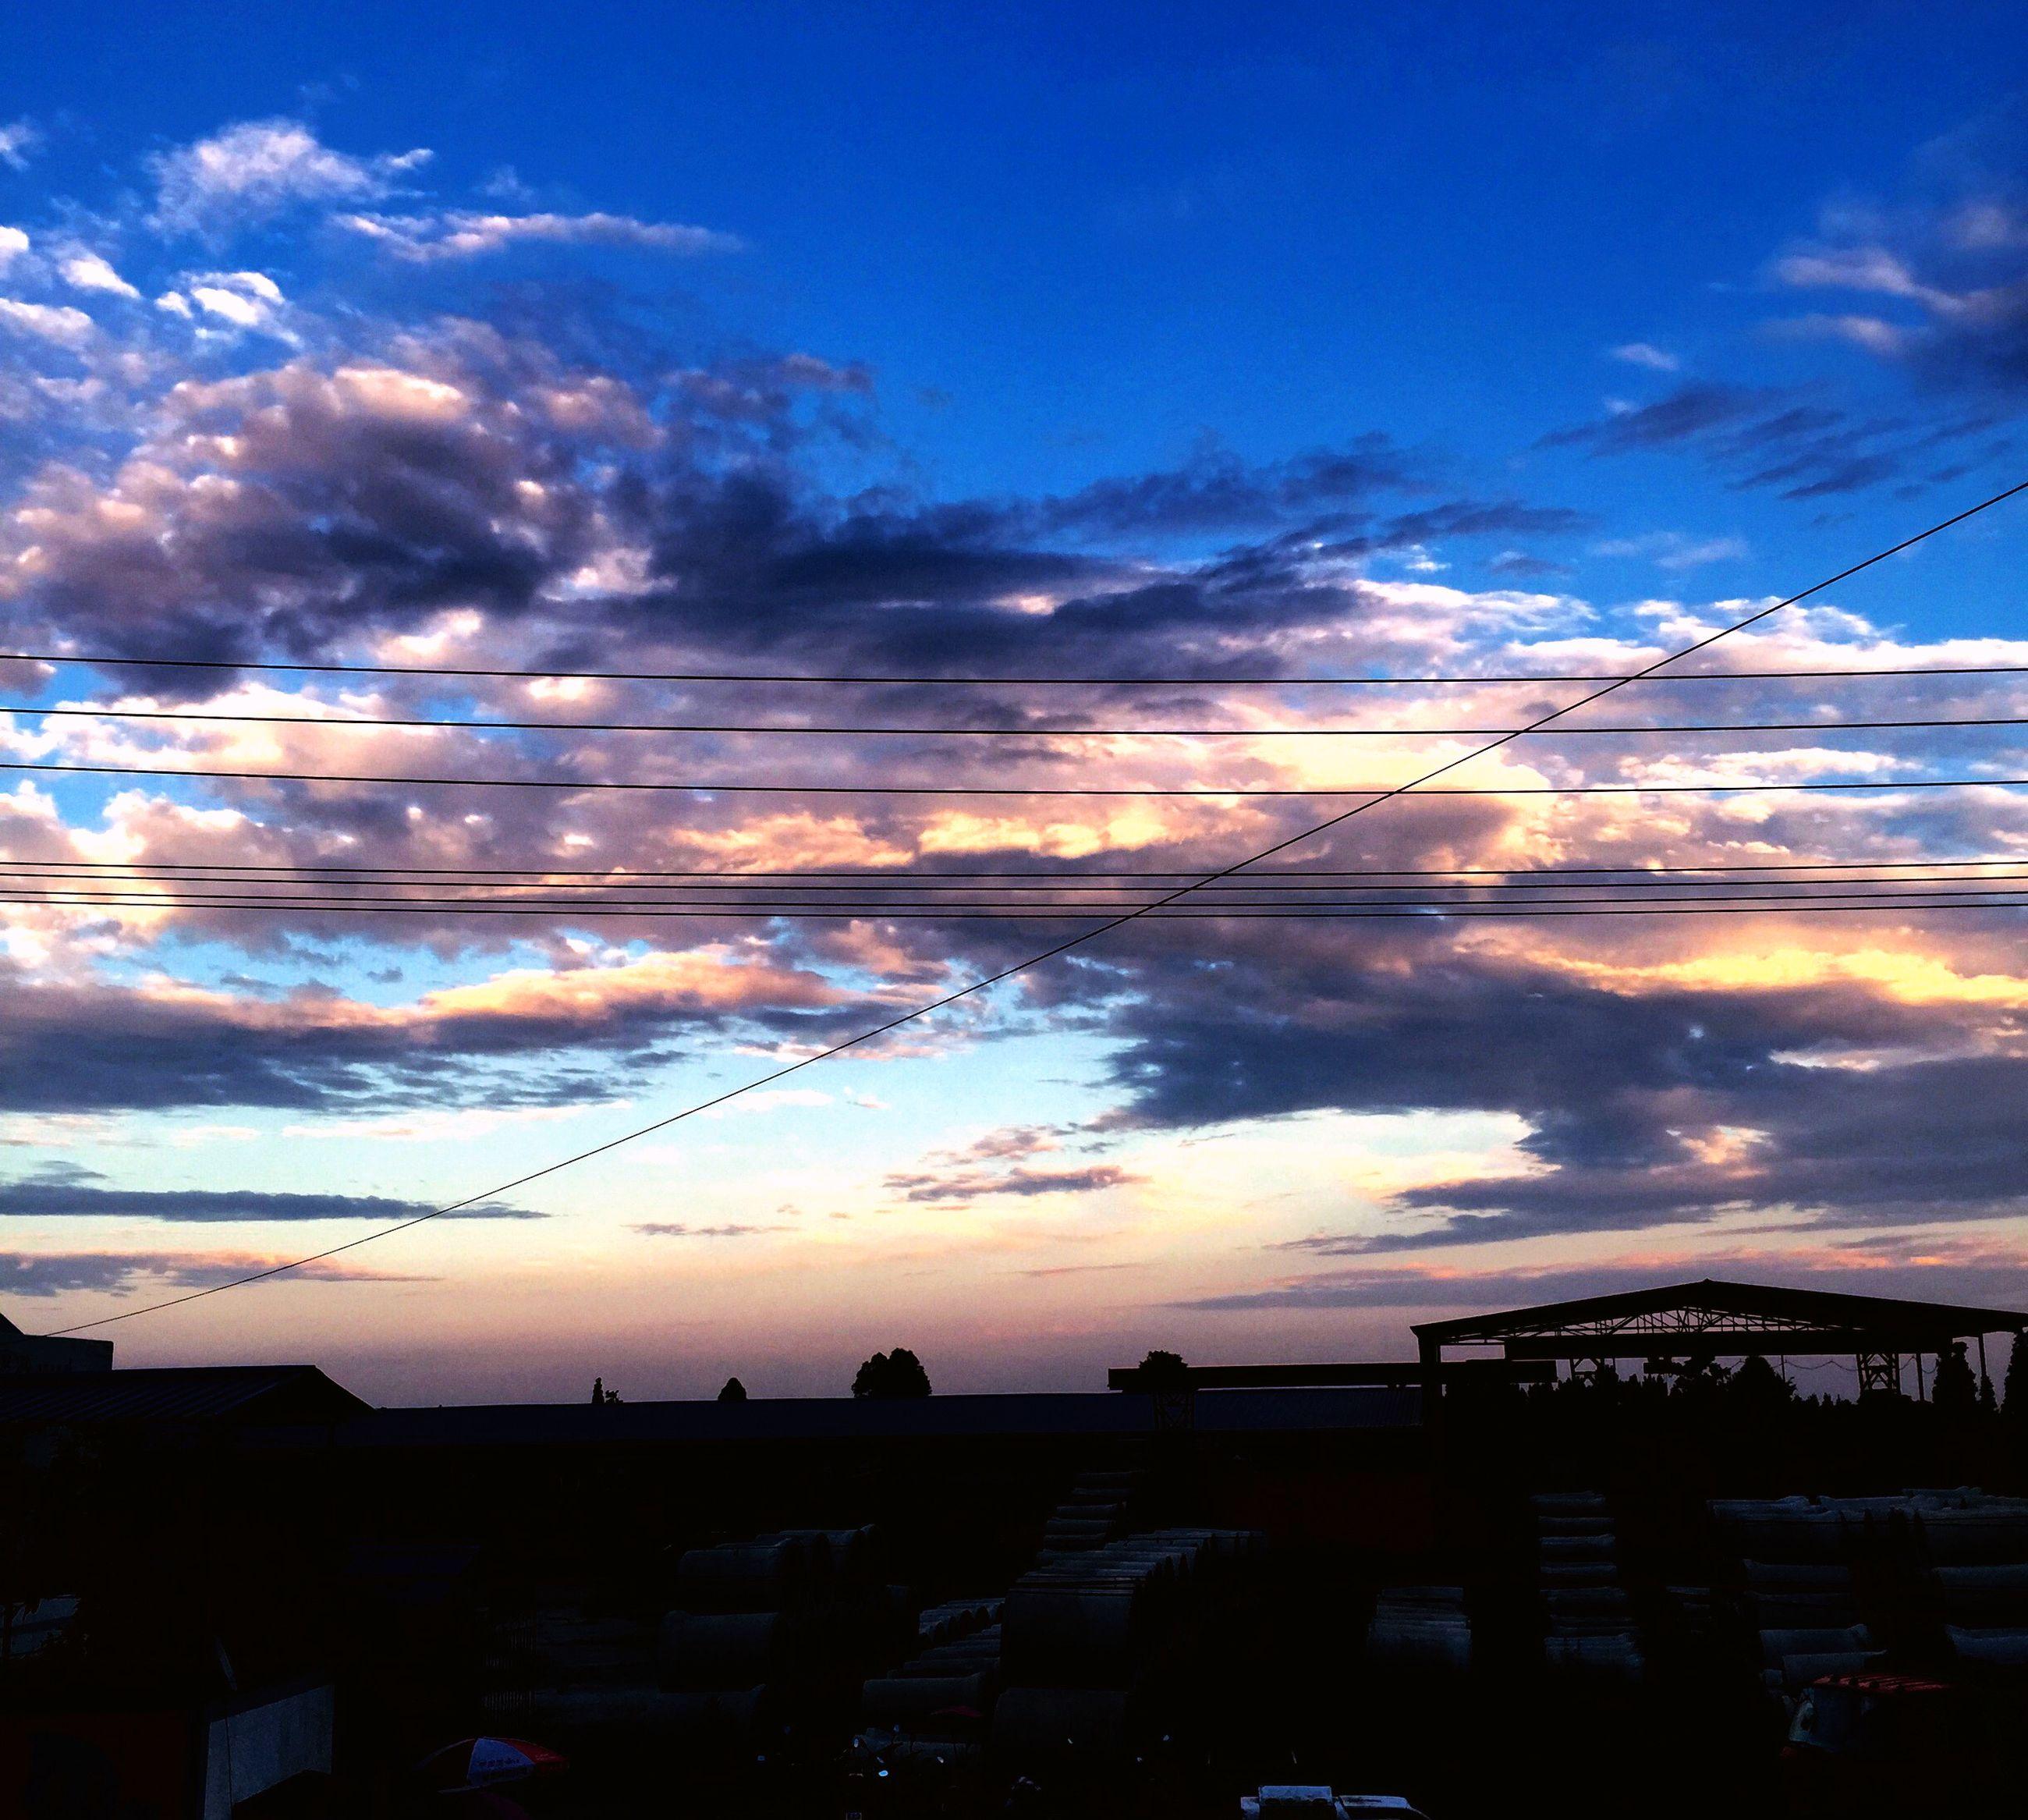 sunset, sky, transportation, cloud - sky, mode of transport, connection, silhouette, cloud, power line, scenics, car, nature, beauty in nature, dusk, electricity pylon, cloudy, orange color, land vehicle, blue, no people